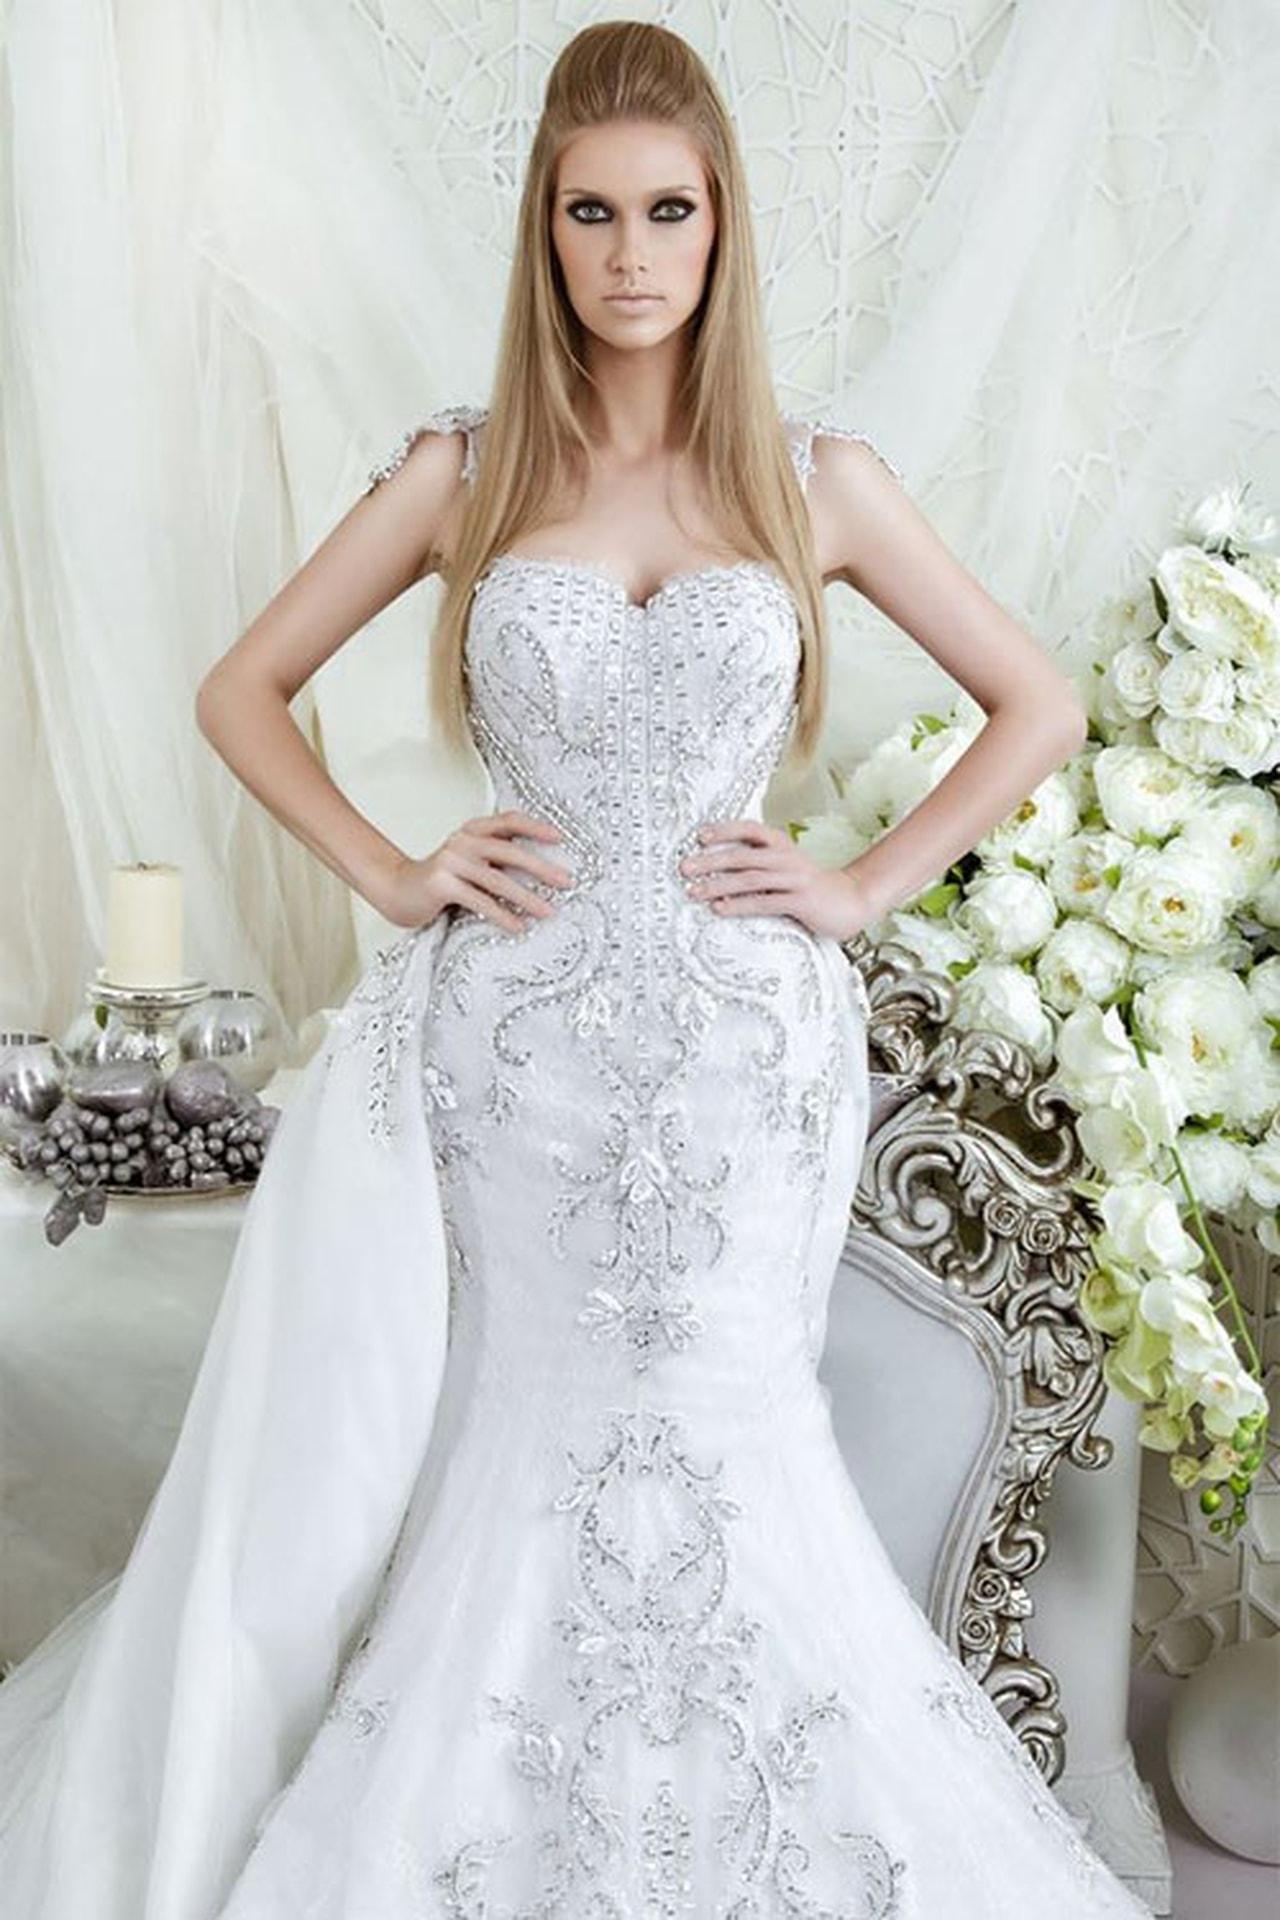 بالصور اجمل فساتين اعراس , احلى فساتين زفاف ناعمة 5683 3